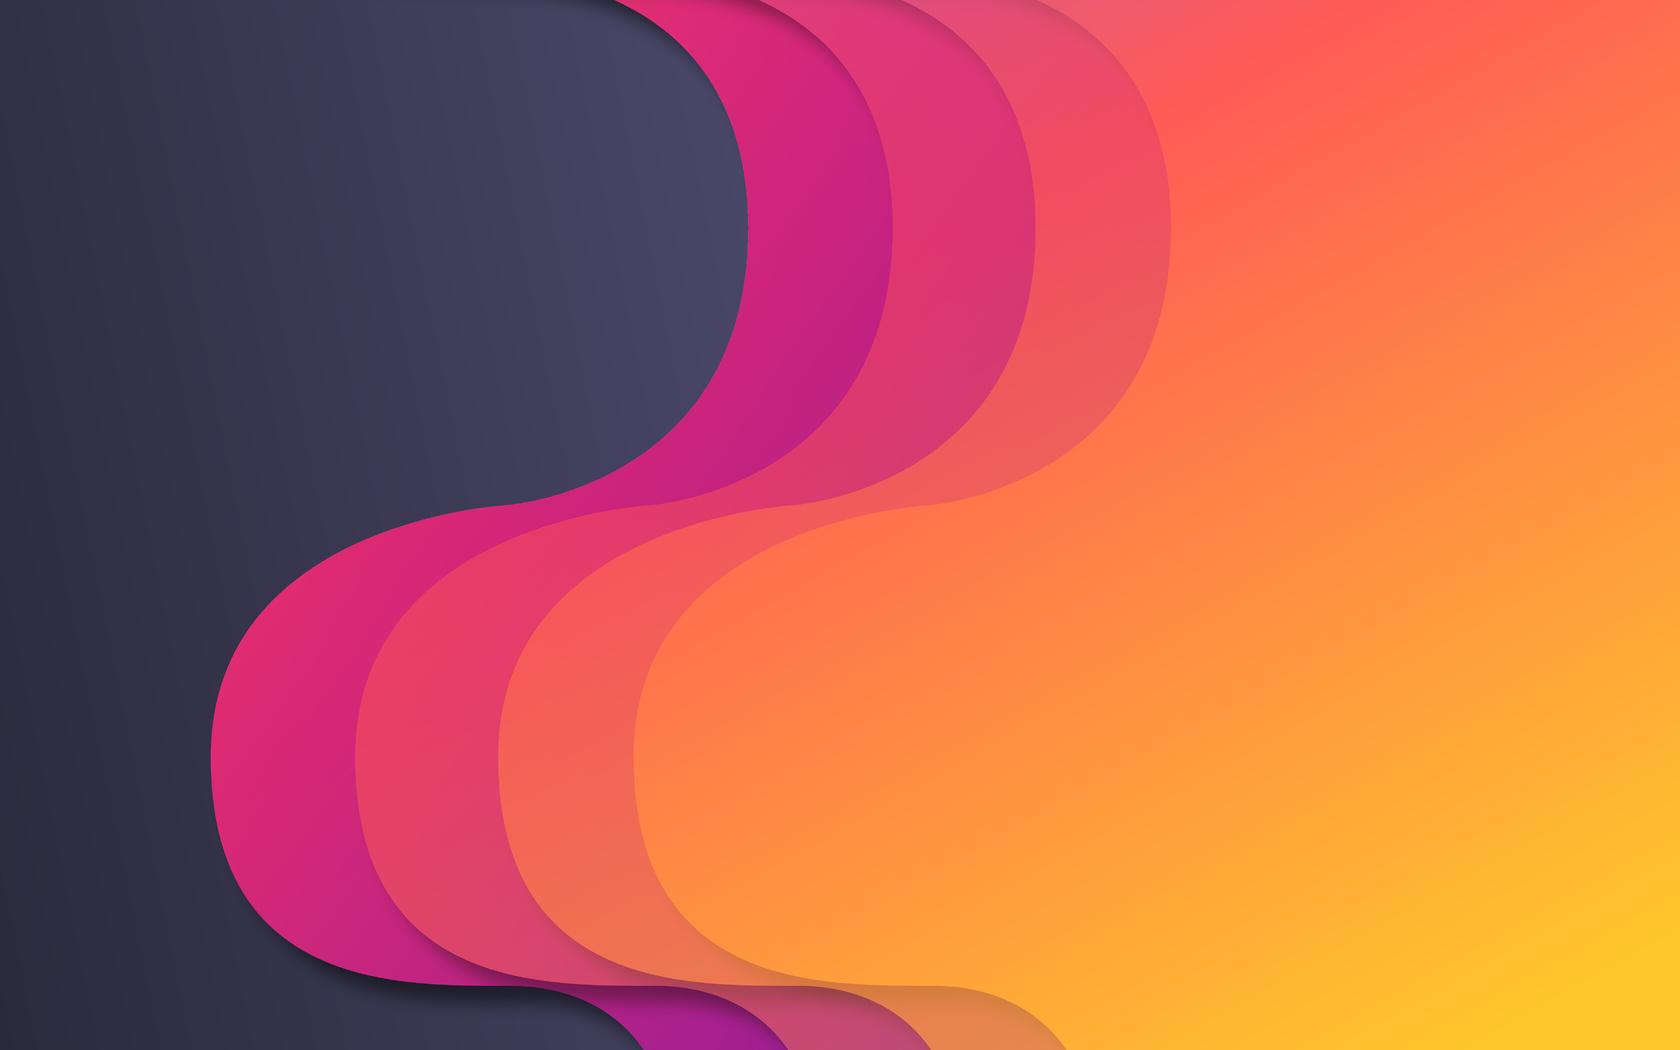 material-design-abstract-8k-zm.jpg